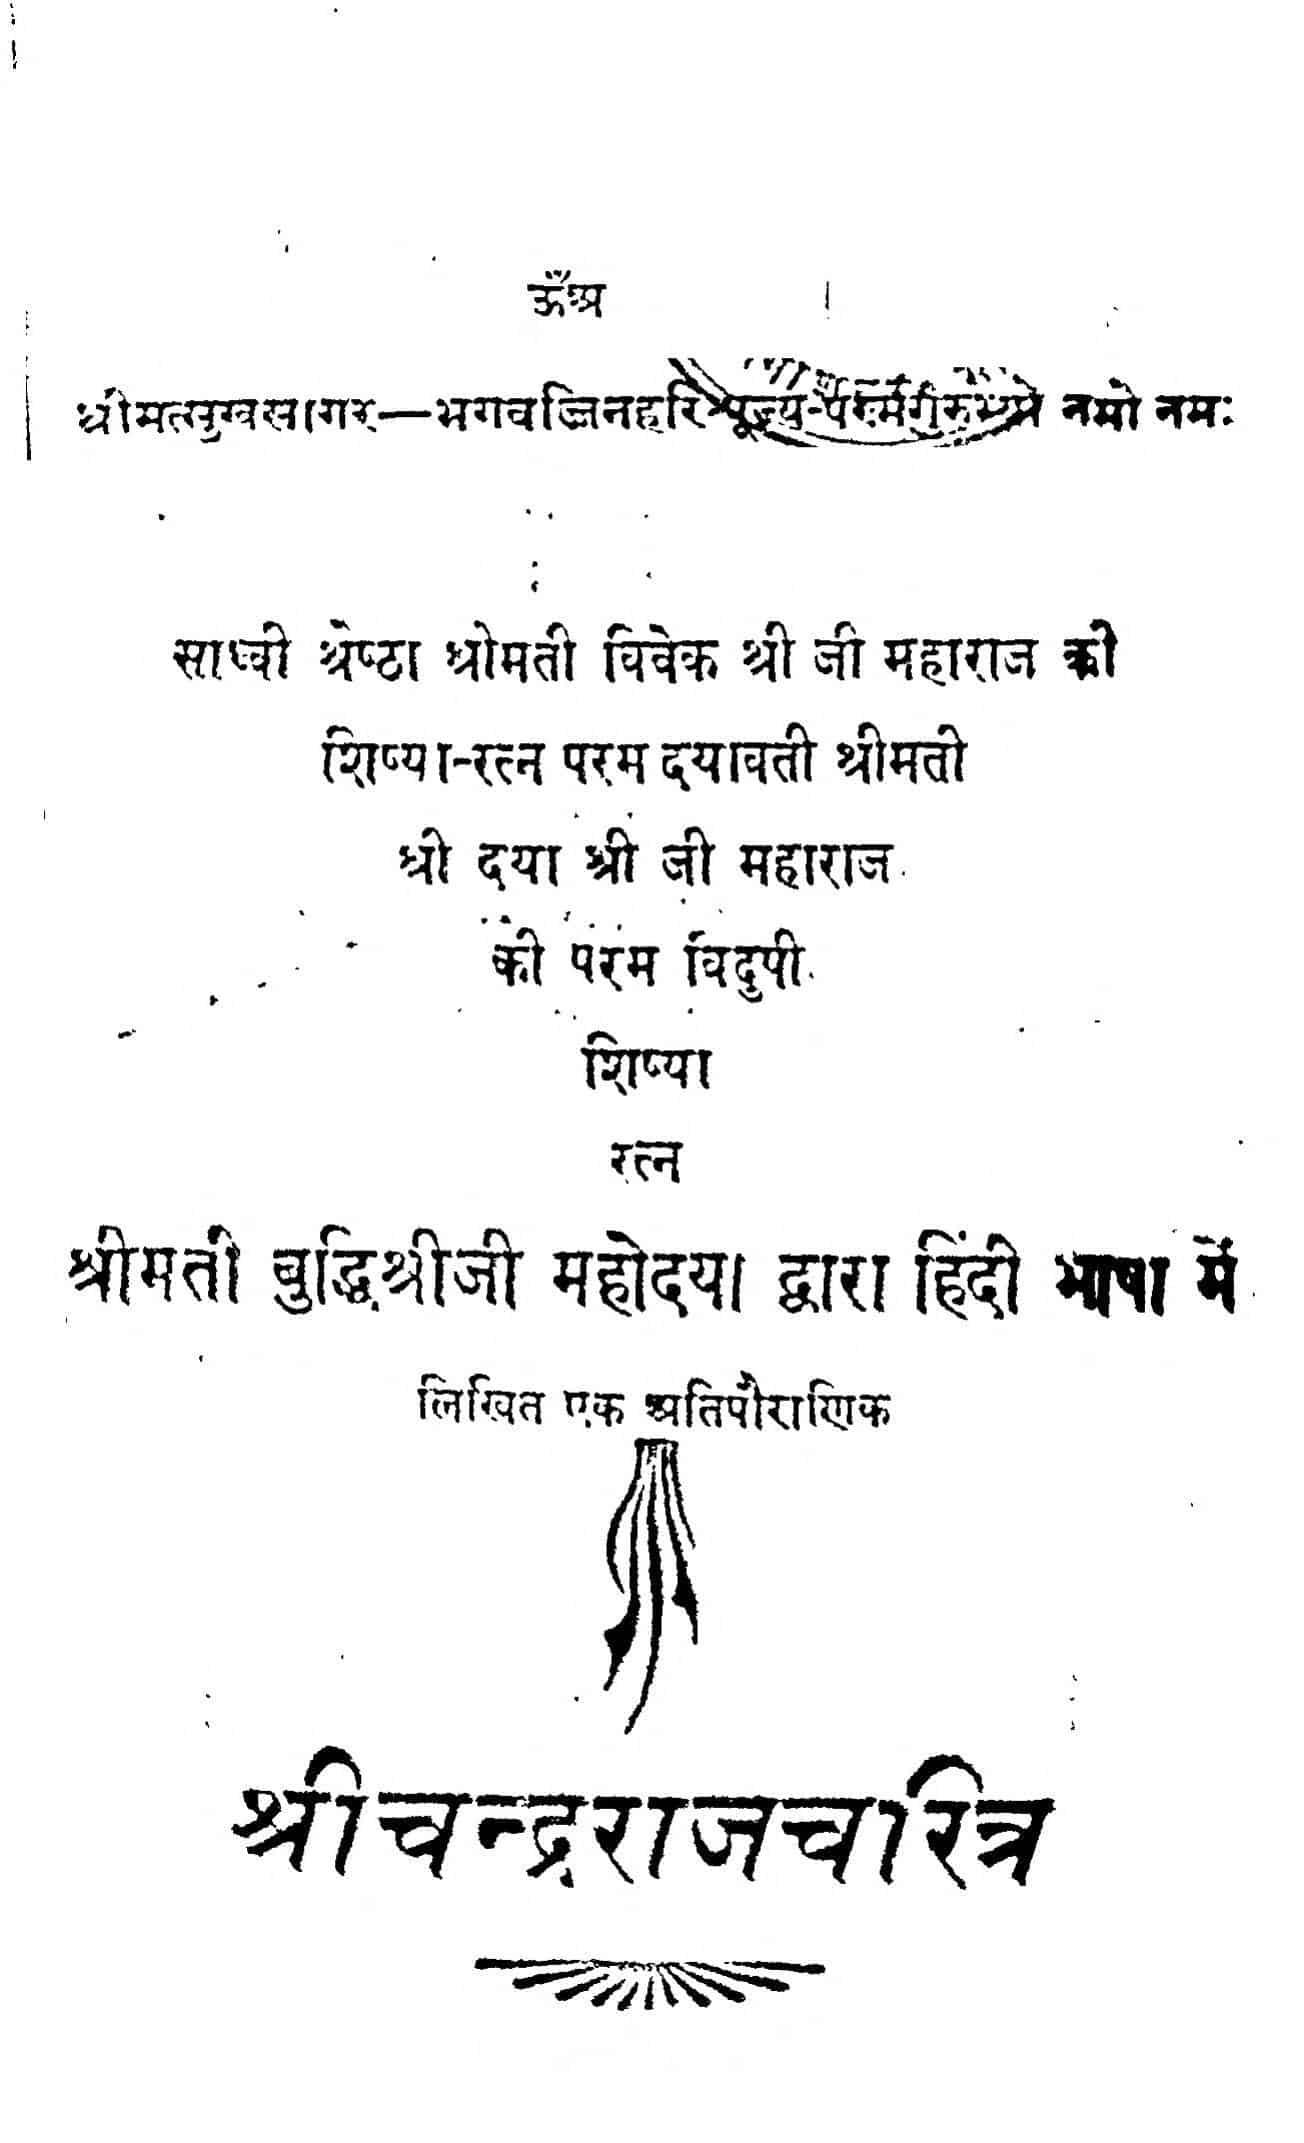 Shree Chandrarajcharitra by श्रीबुद्धिजी - Shreebuddhi Ji